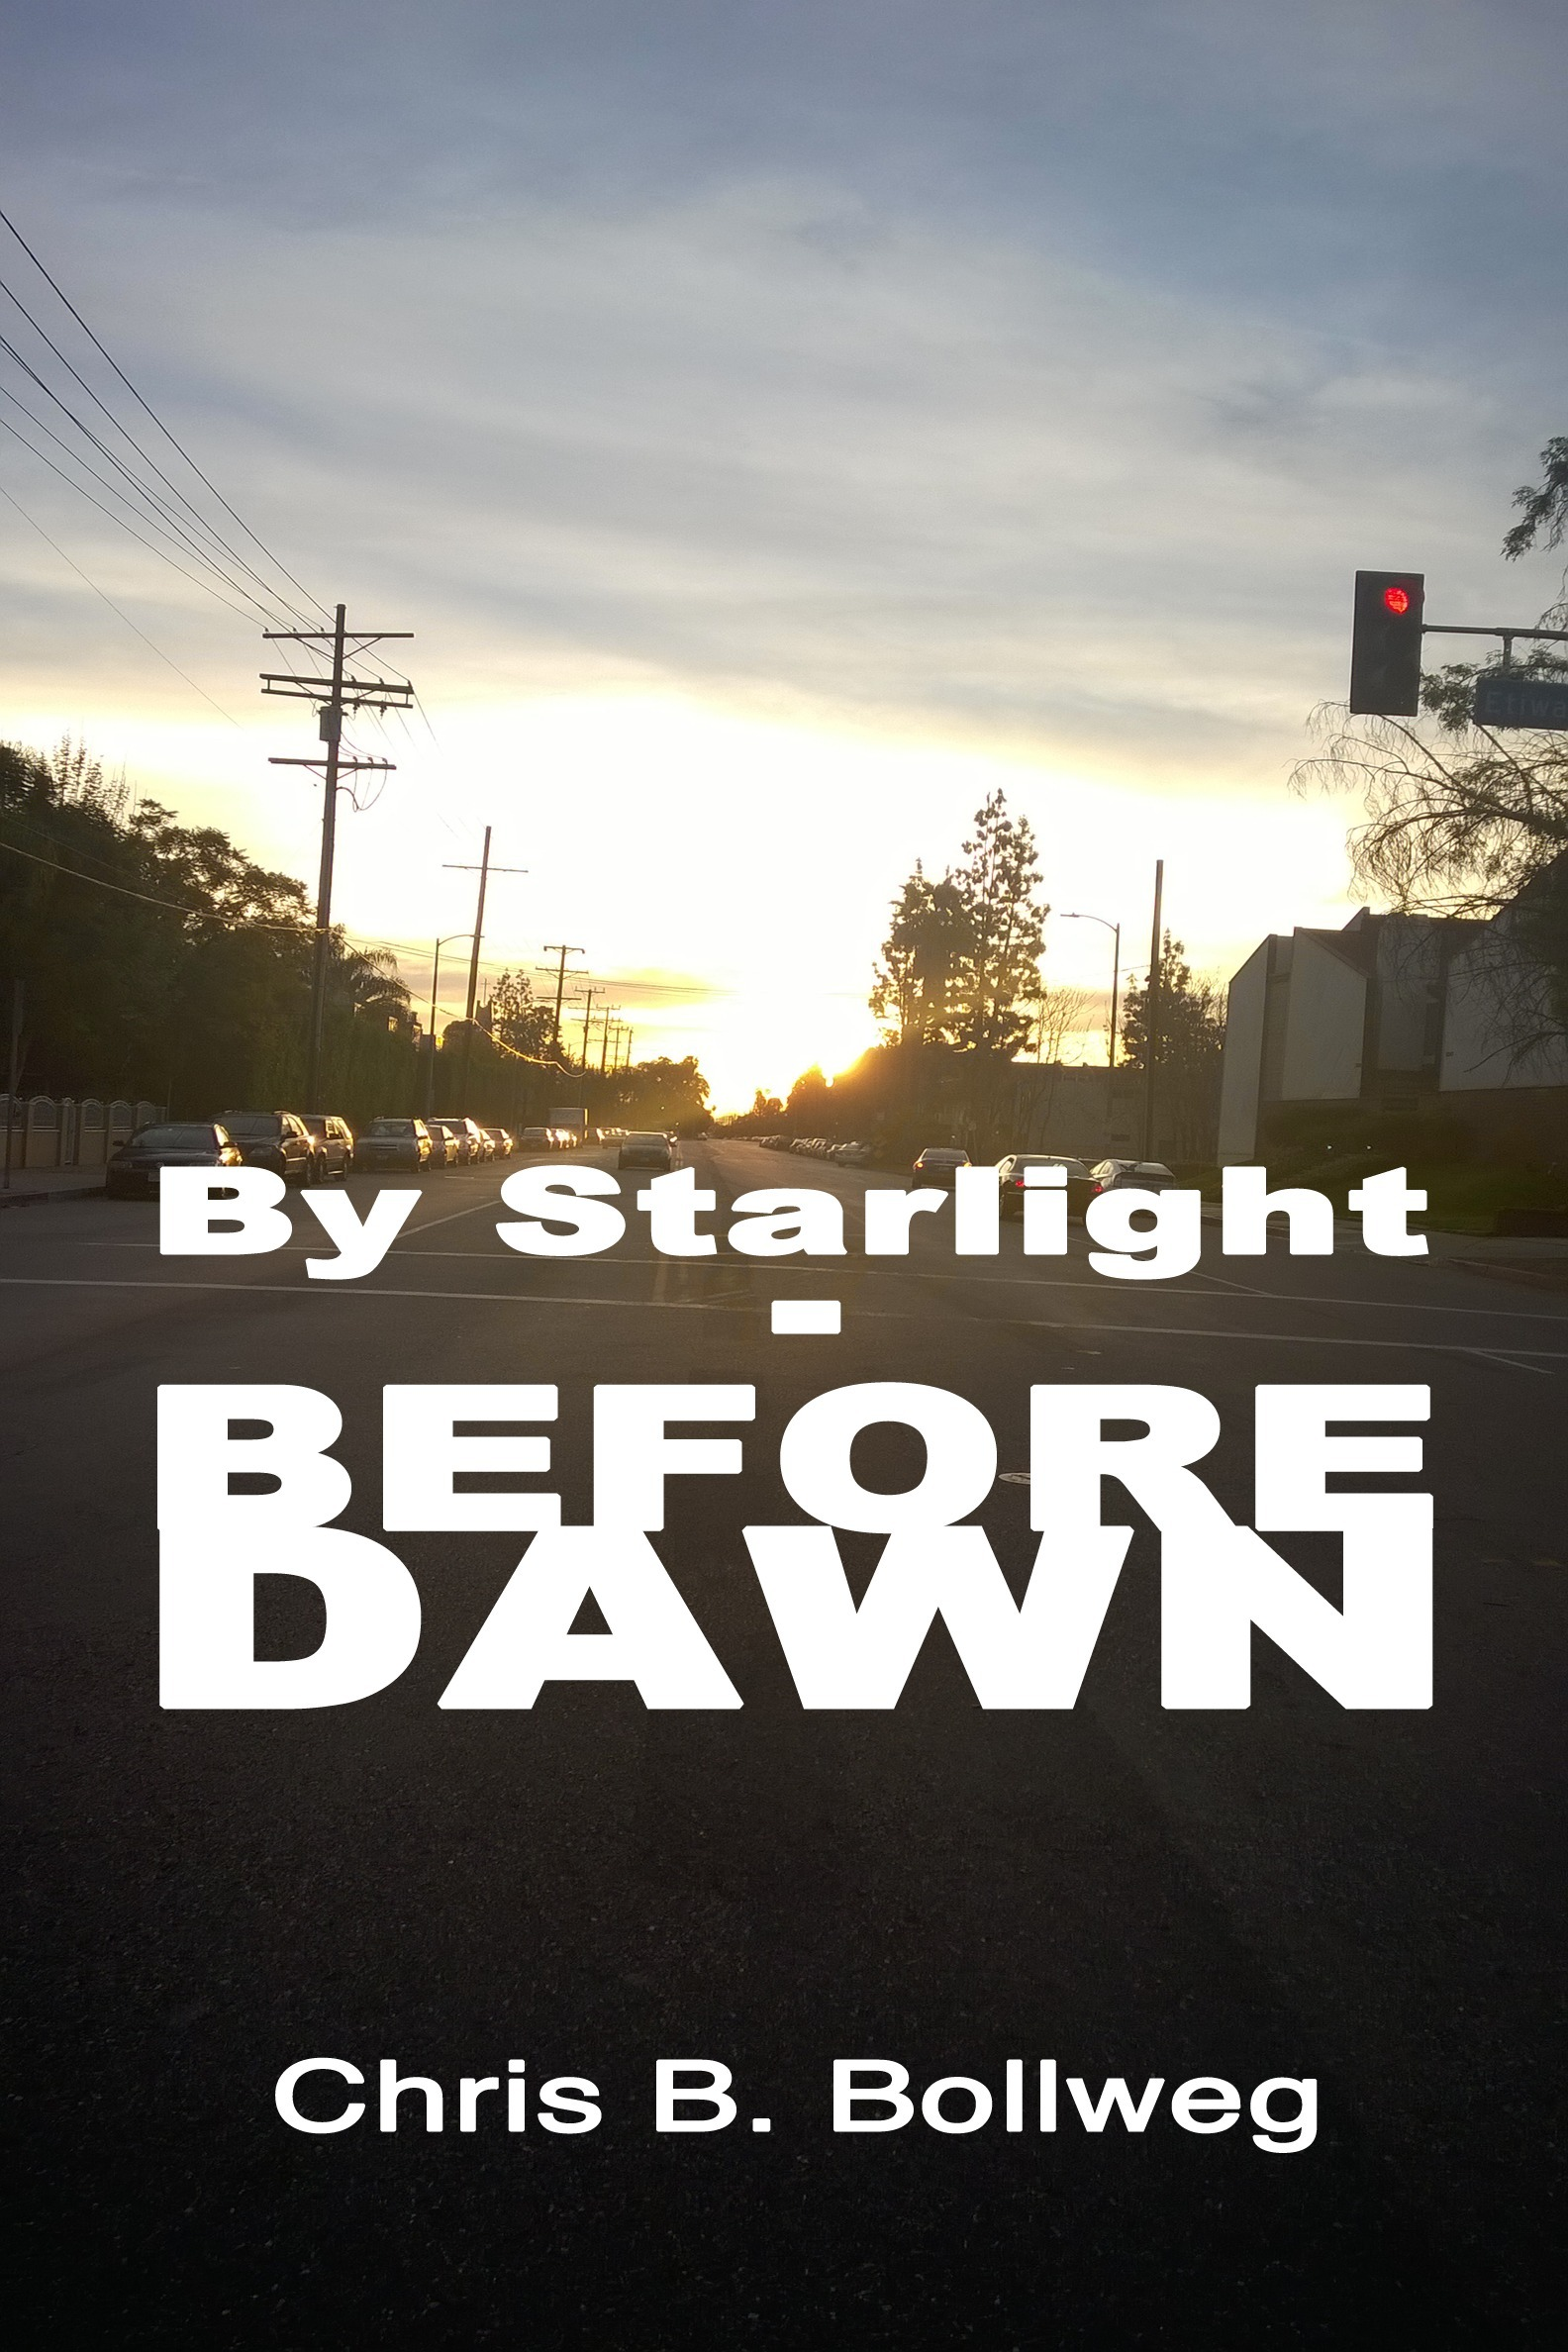 By Starlight: Before Dawn Chris B. Bollweg